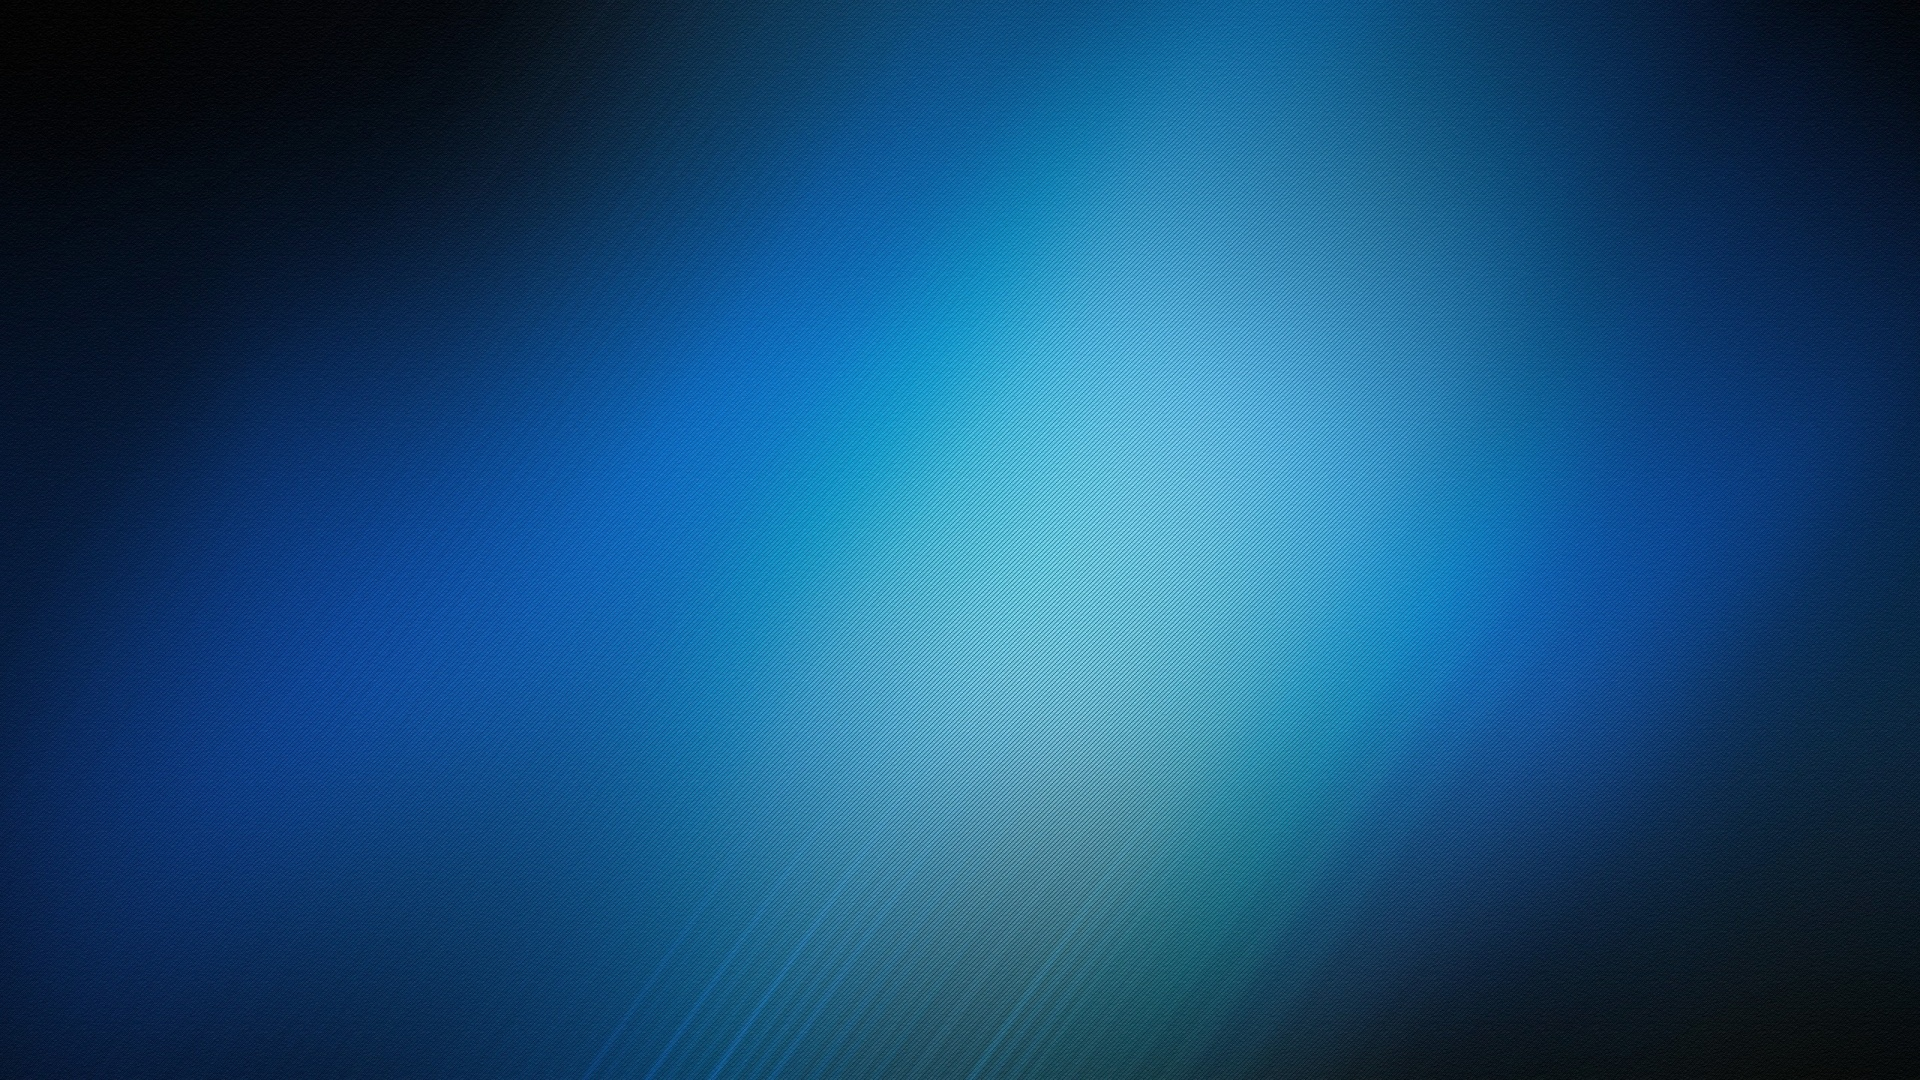 1920x1080 Blue Textures and Light desktop PC and Mac wallpaper 1920x1080